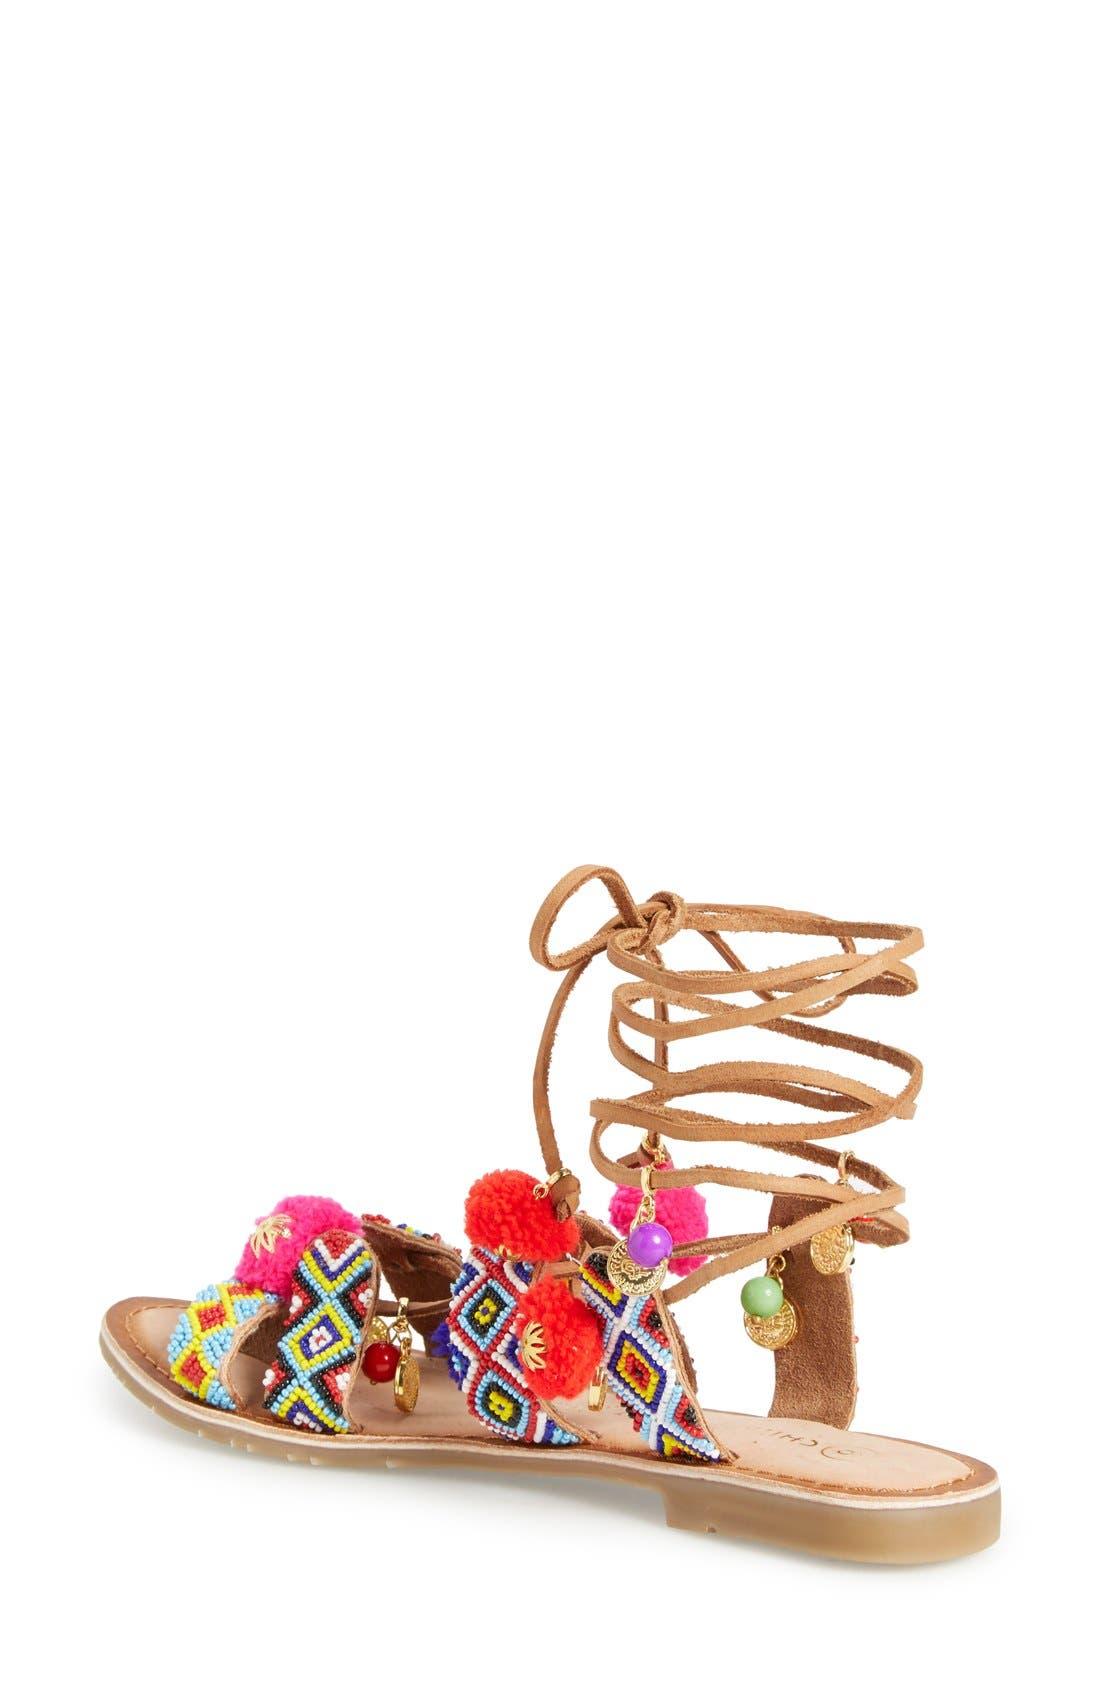 CHINESE LAUNDRY, 'Posh' Embellished Lace-Up Sandal, Alternate thumbnail 2, color, 218